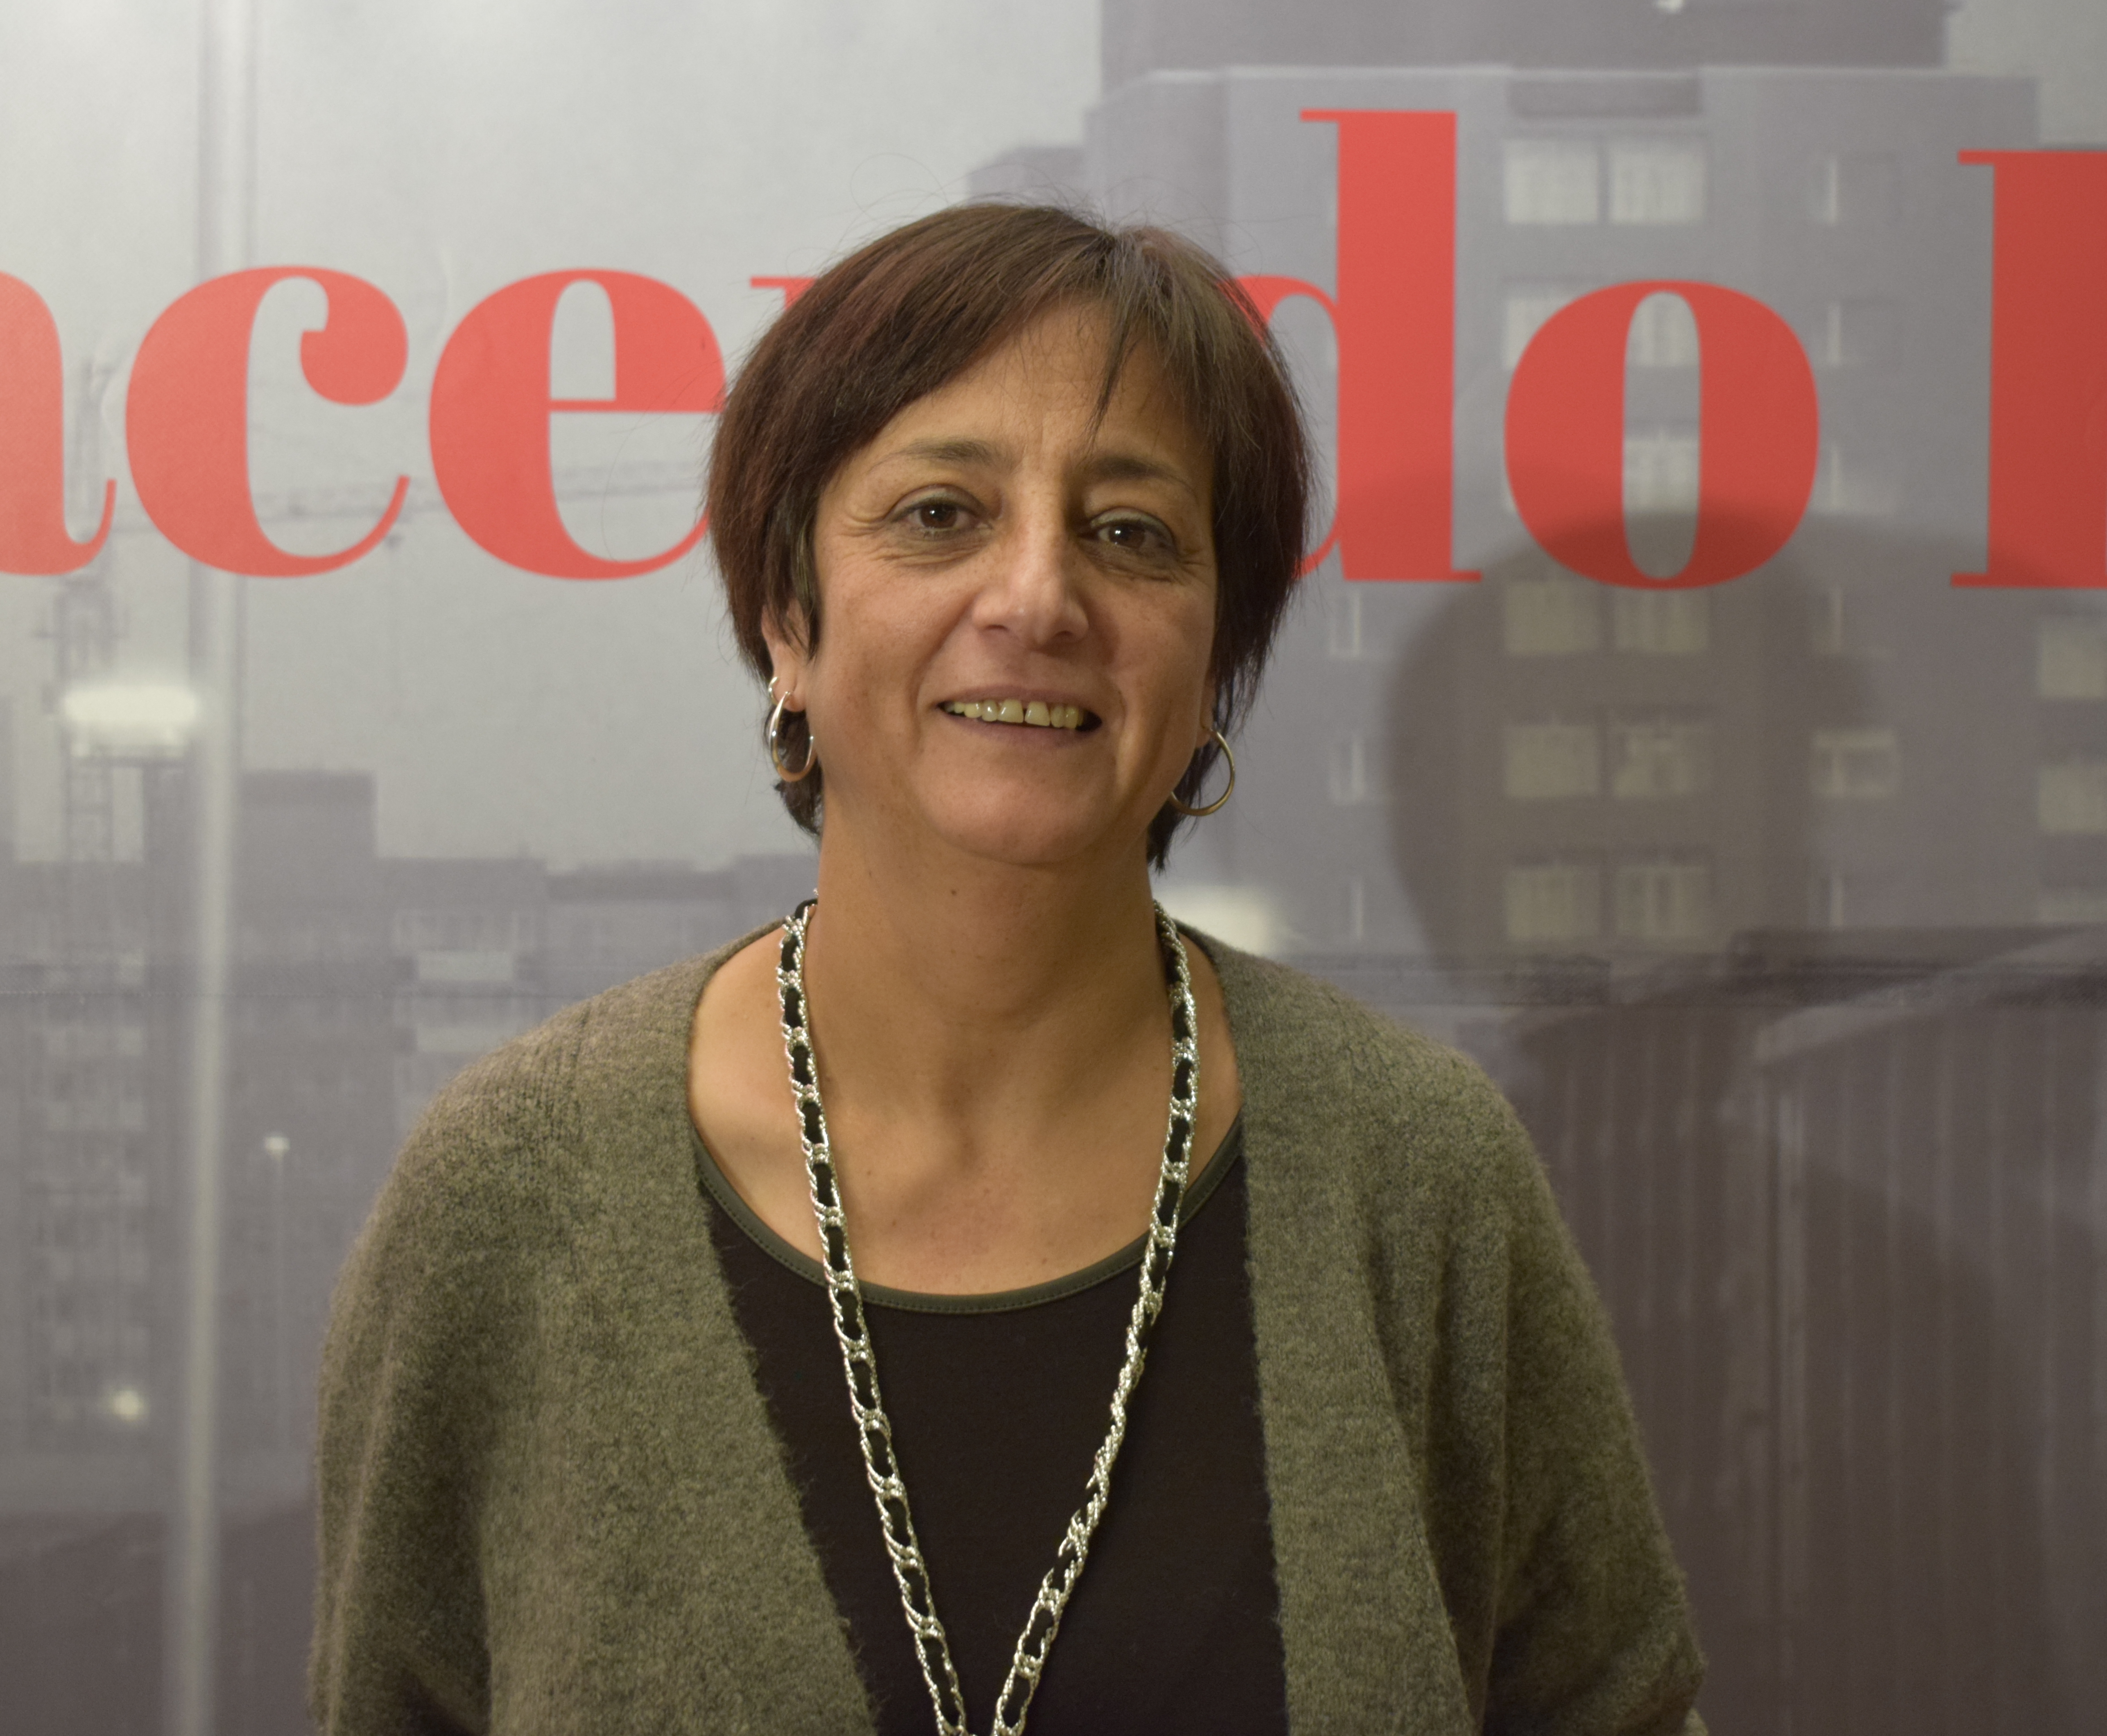 Gloria María Prada Rodríguez